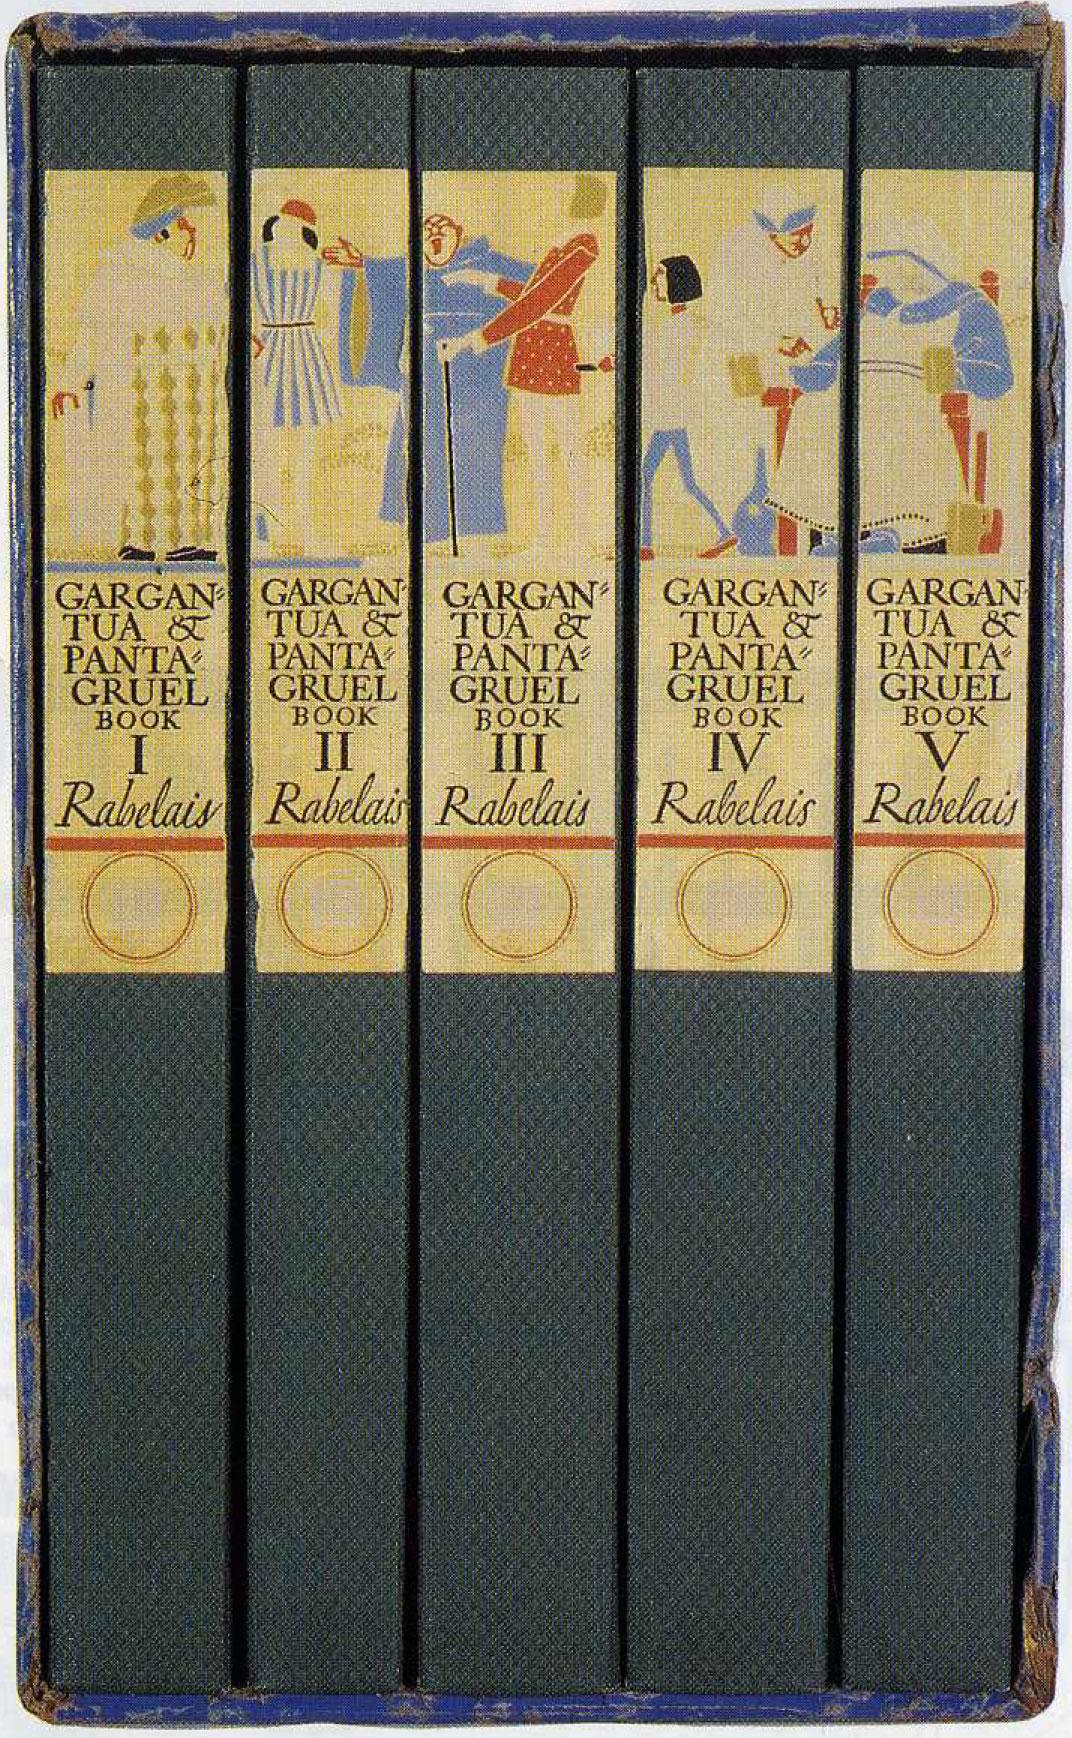 William-Addison-Dwiggins-livres-gargantua-1936